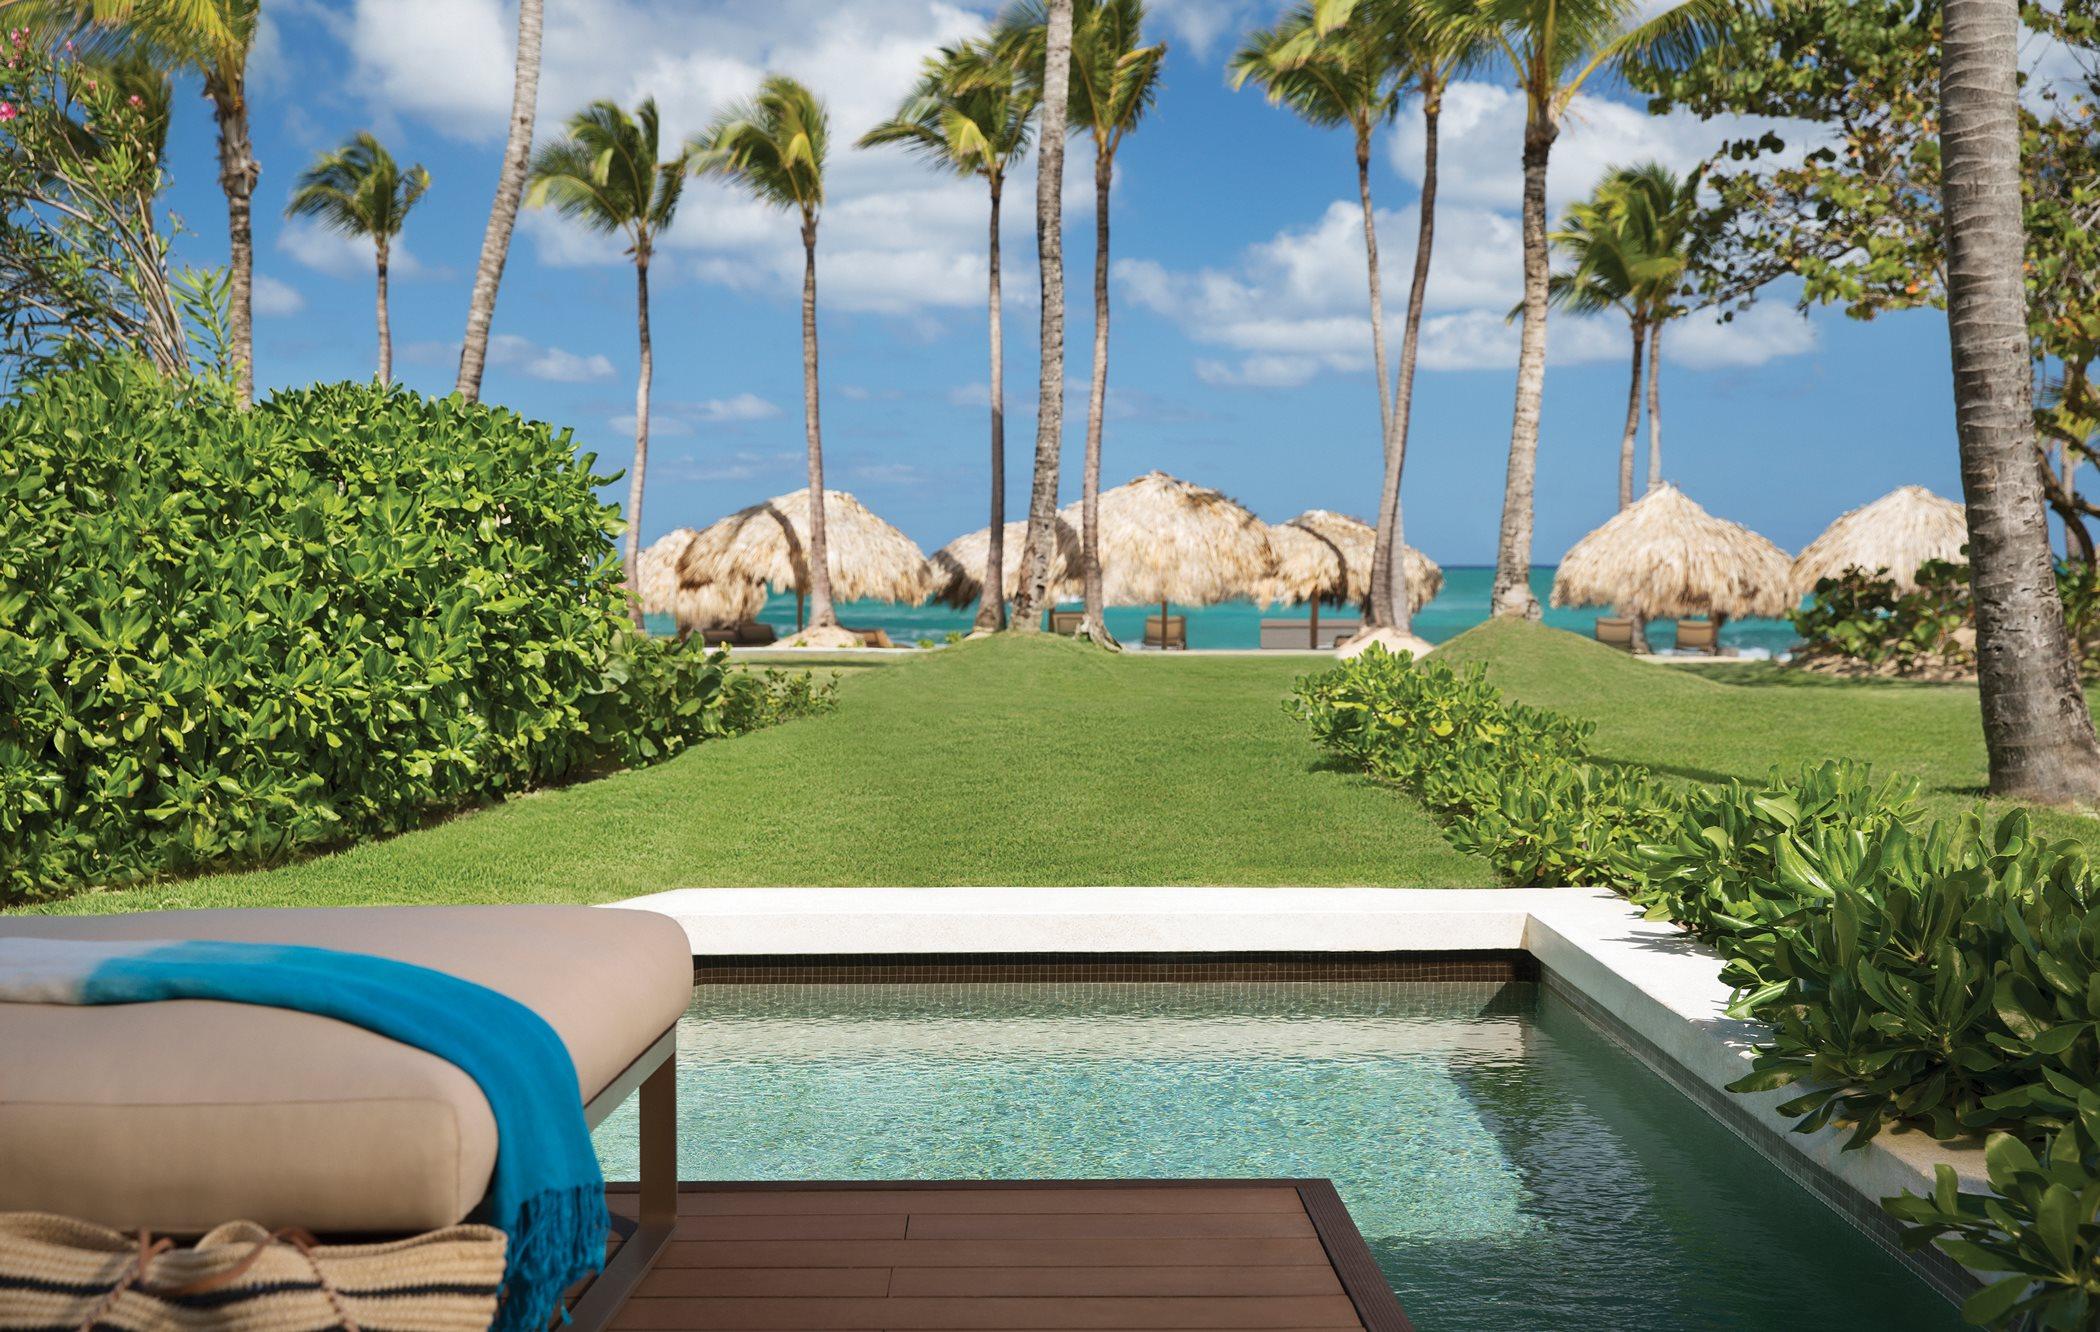 Excellence Punta Cana Aqua Wellness Spa Treatment